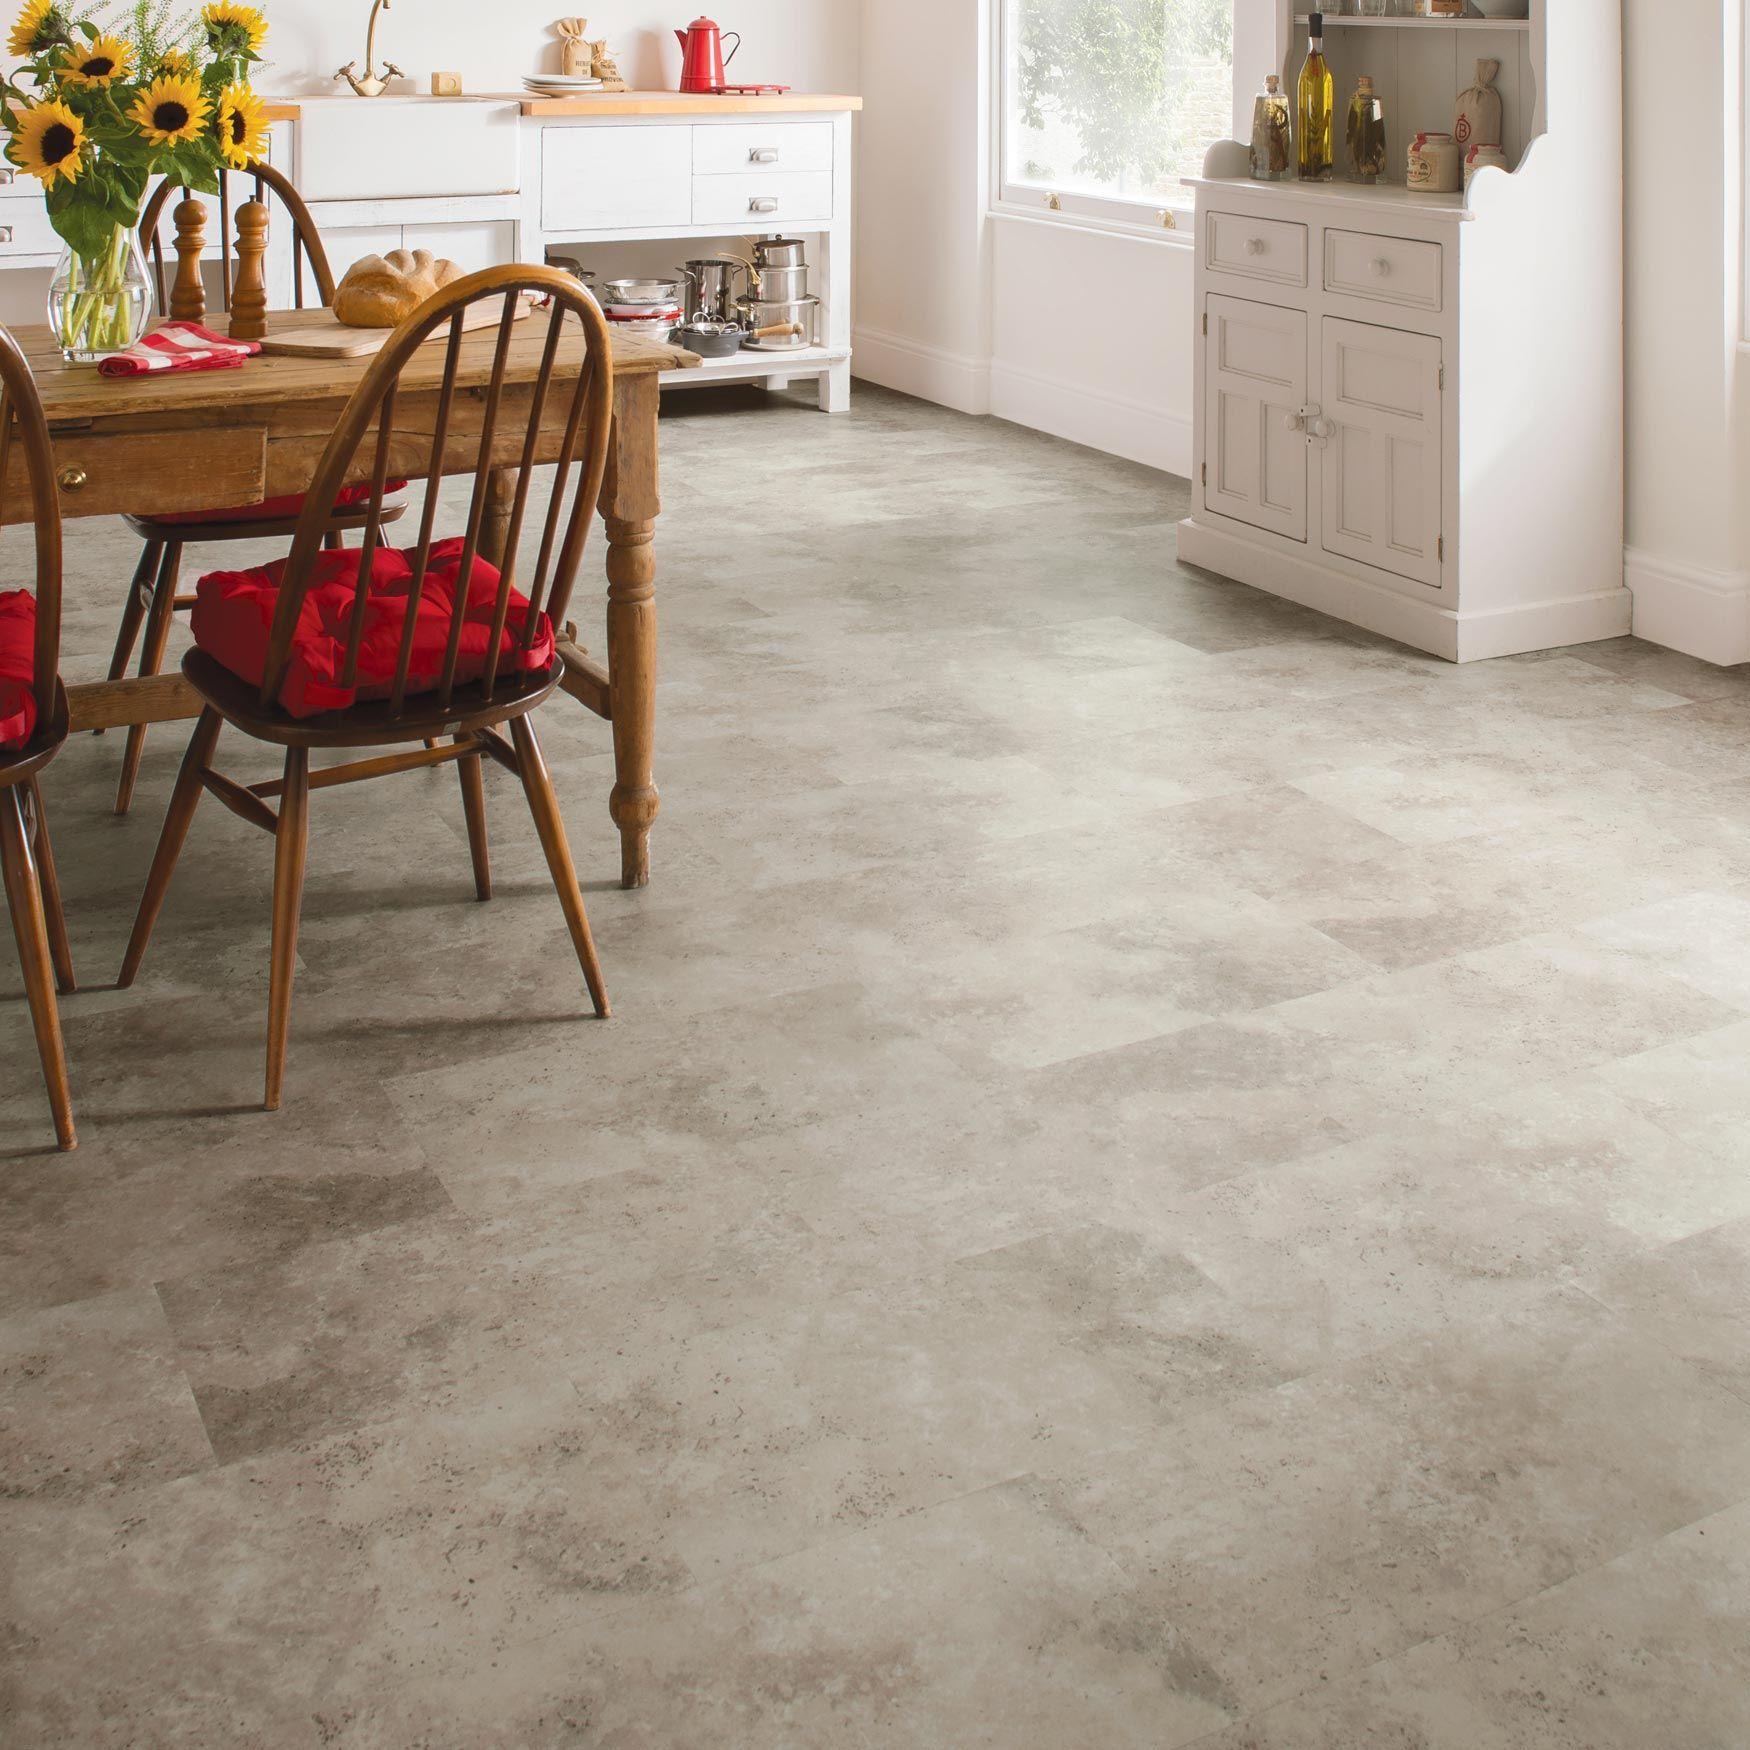 Karndean Palio Clic In Pienza Ct403 Home Inspiration Flooring Inspo Interior Design Luxury Diy